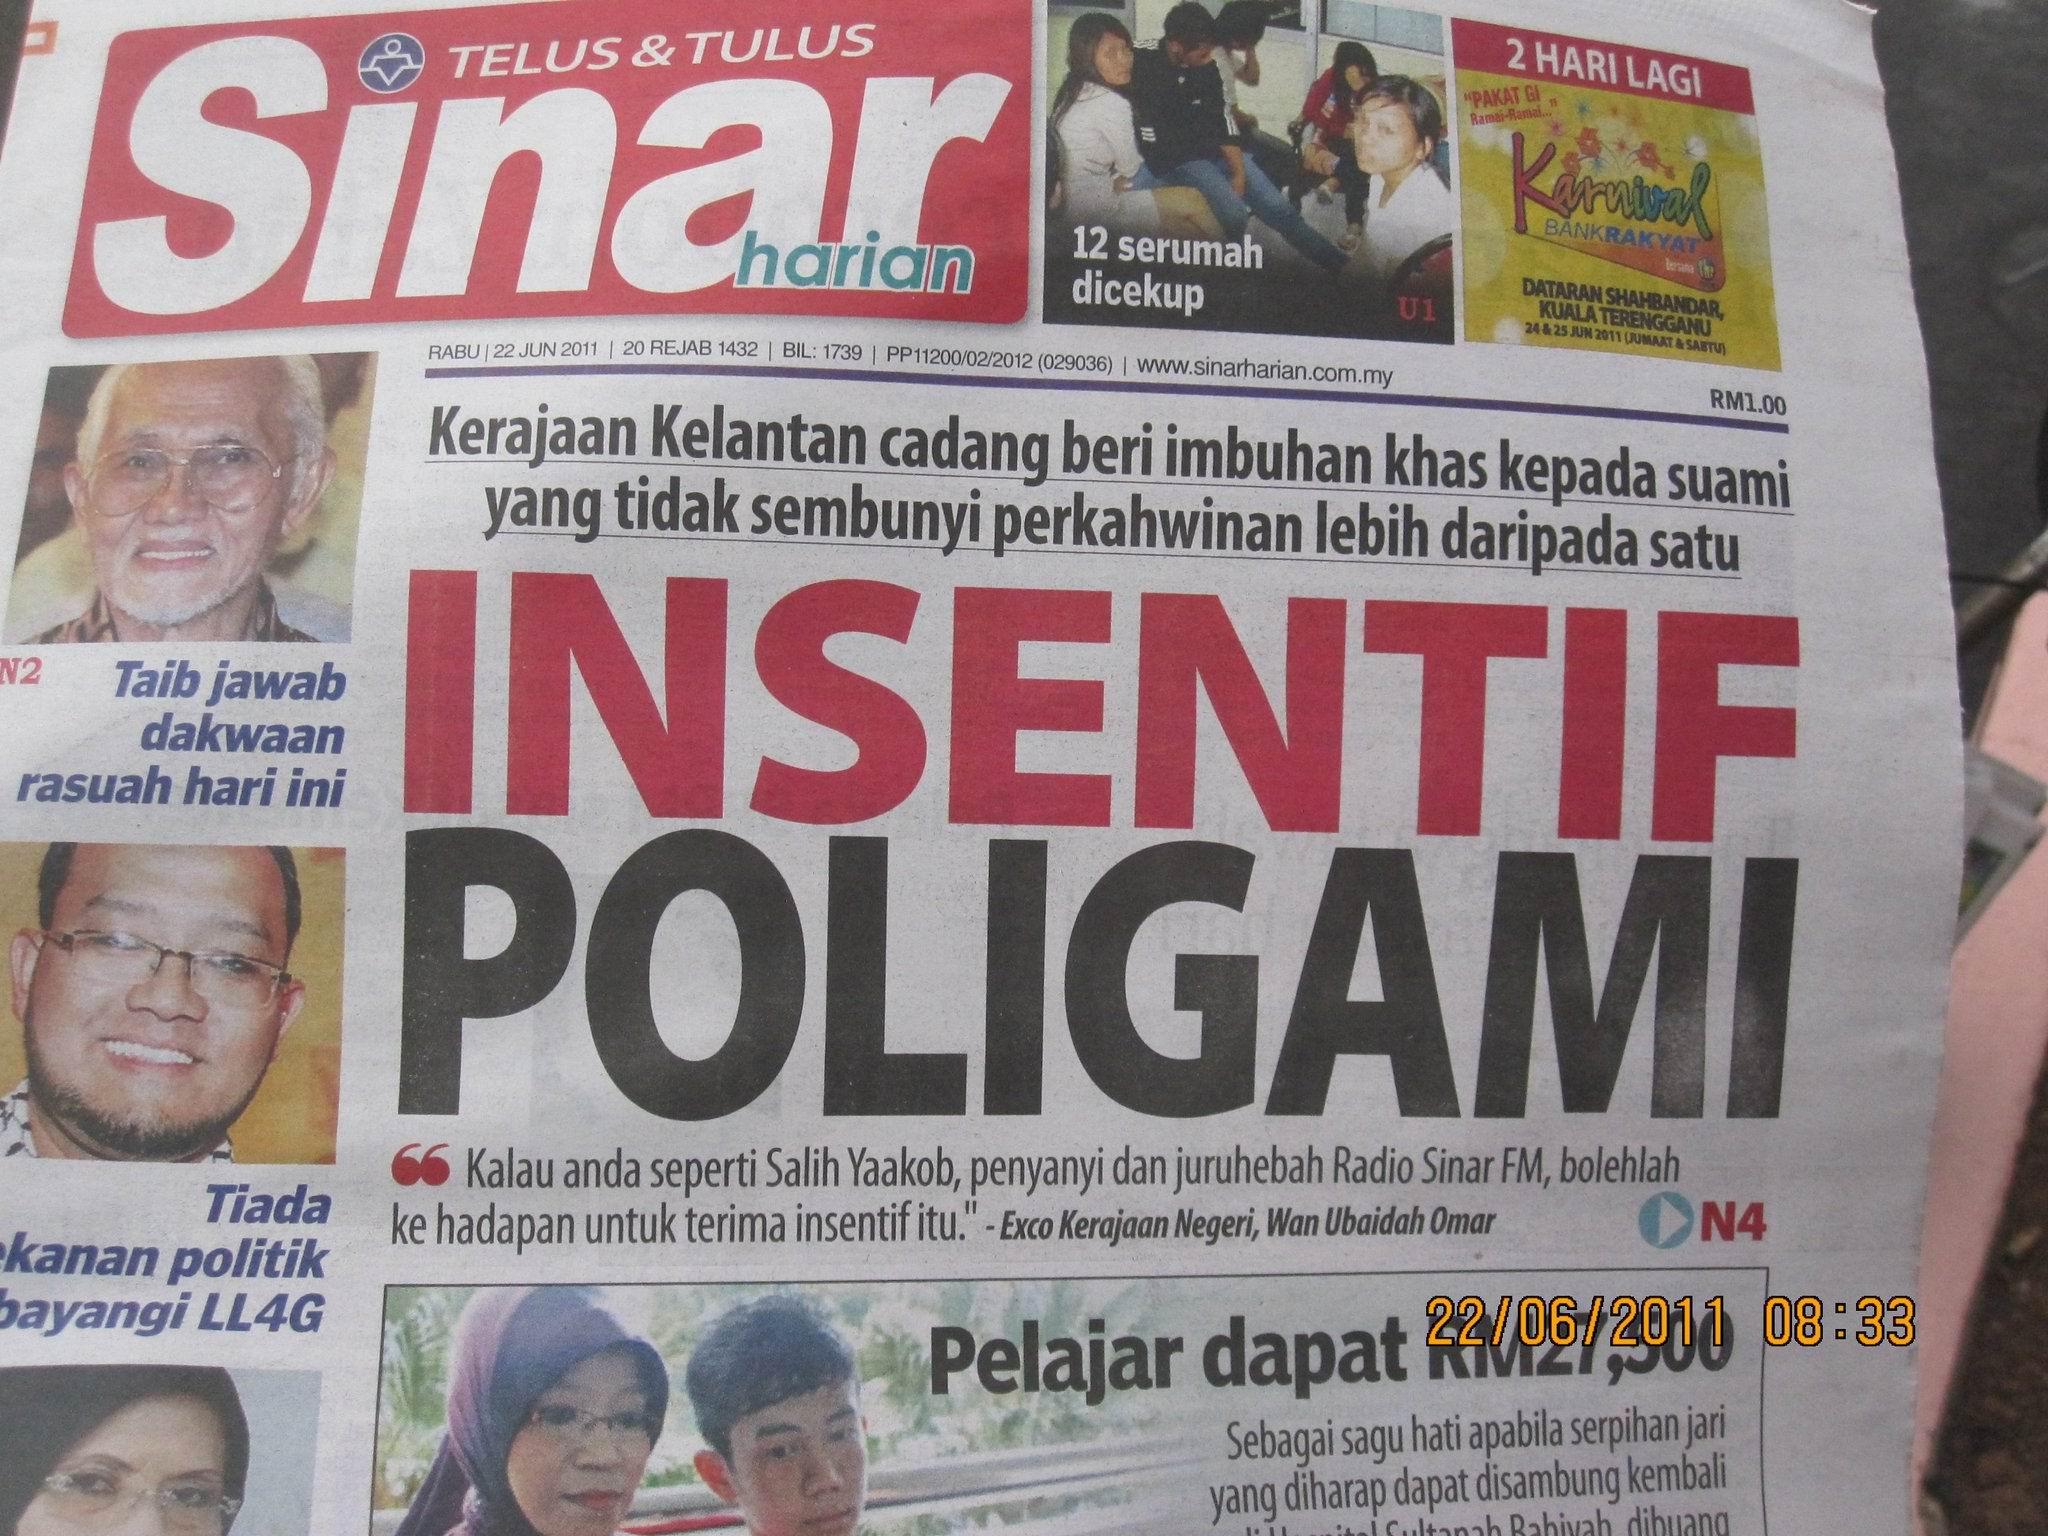 insentif poligami